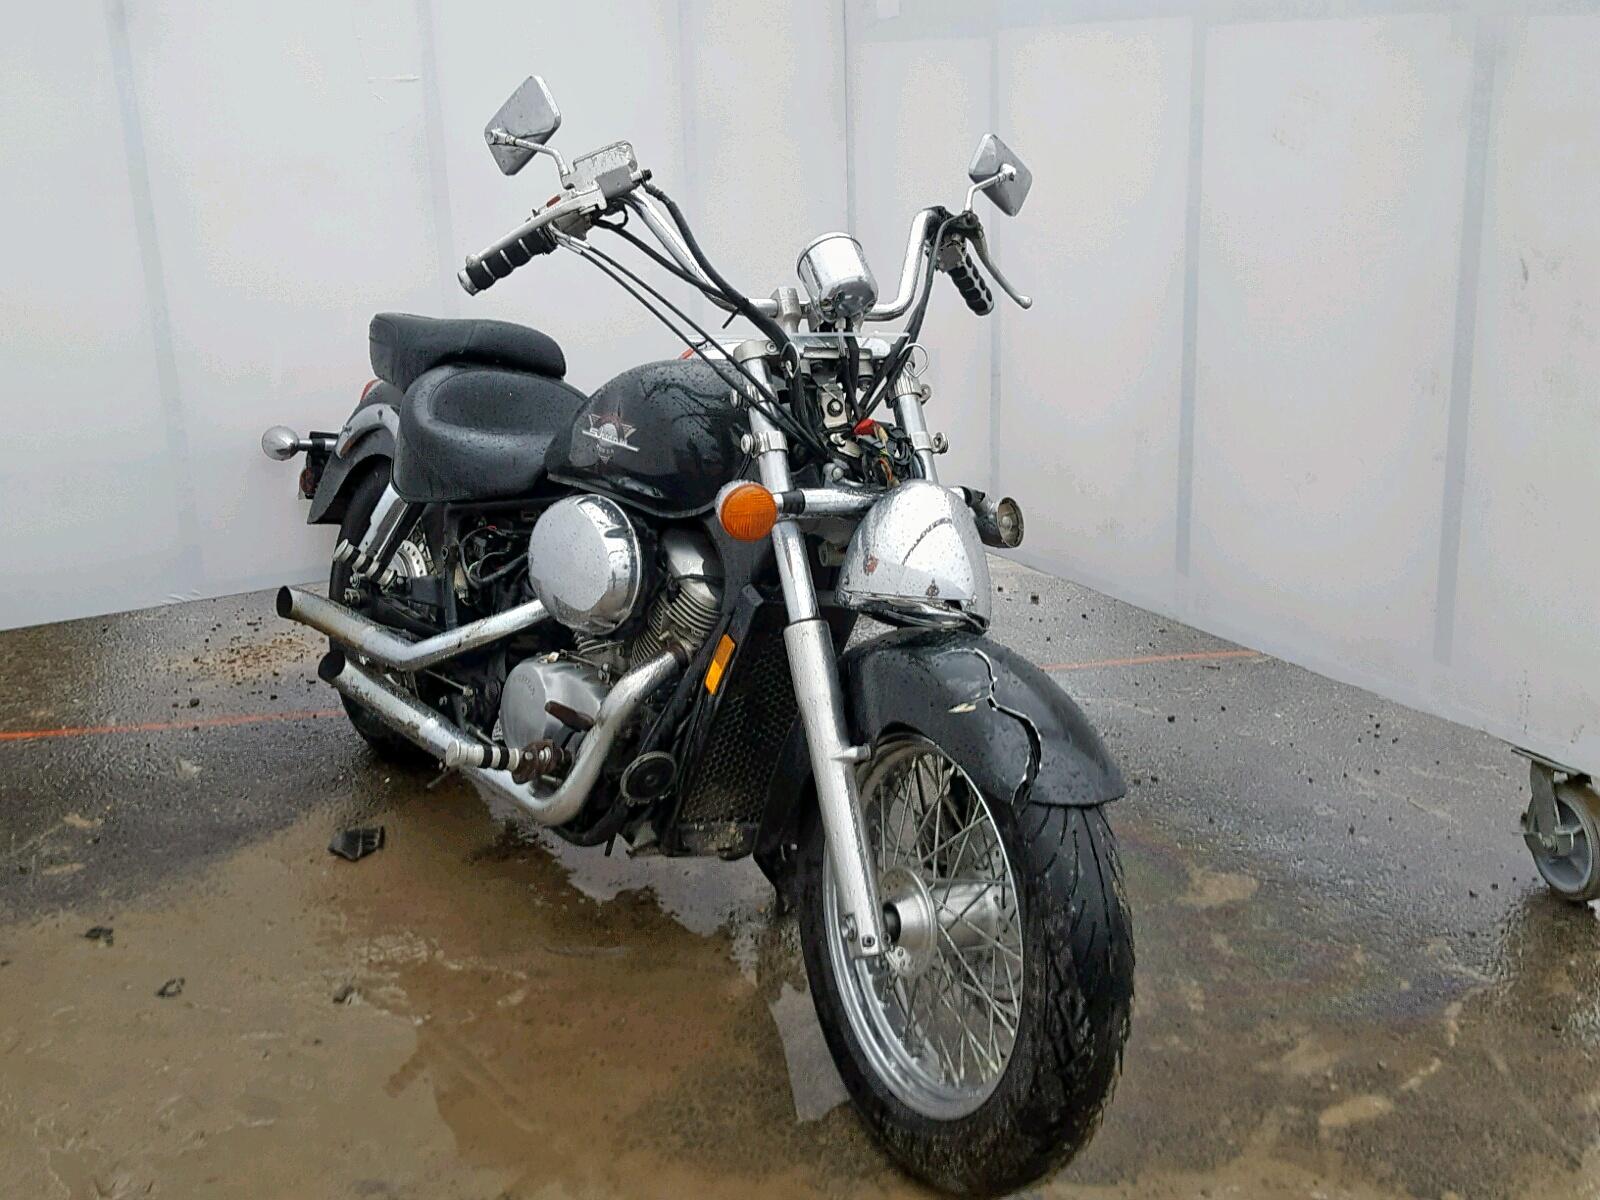 Salvage 2000 Honda VT750 C for sale